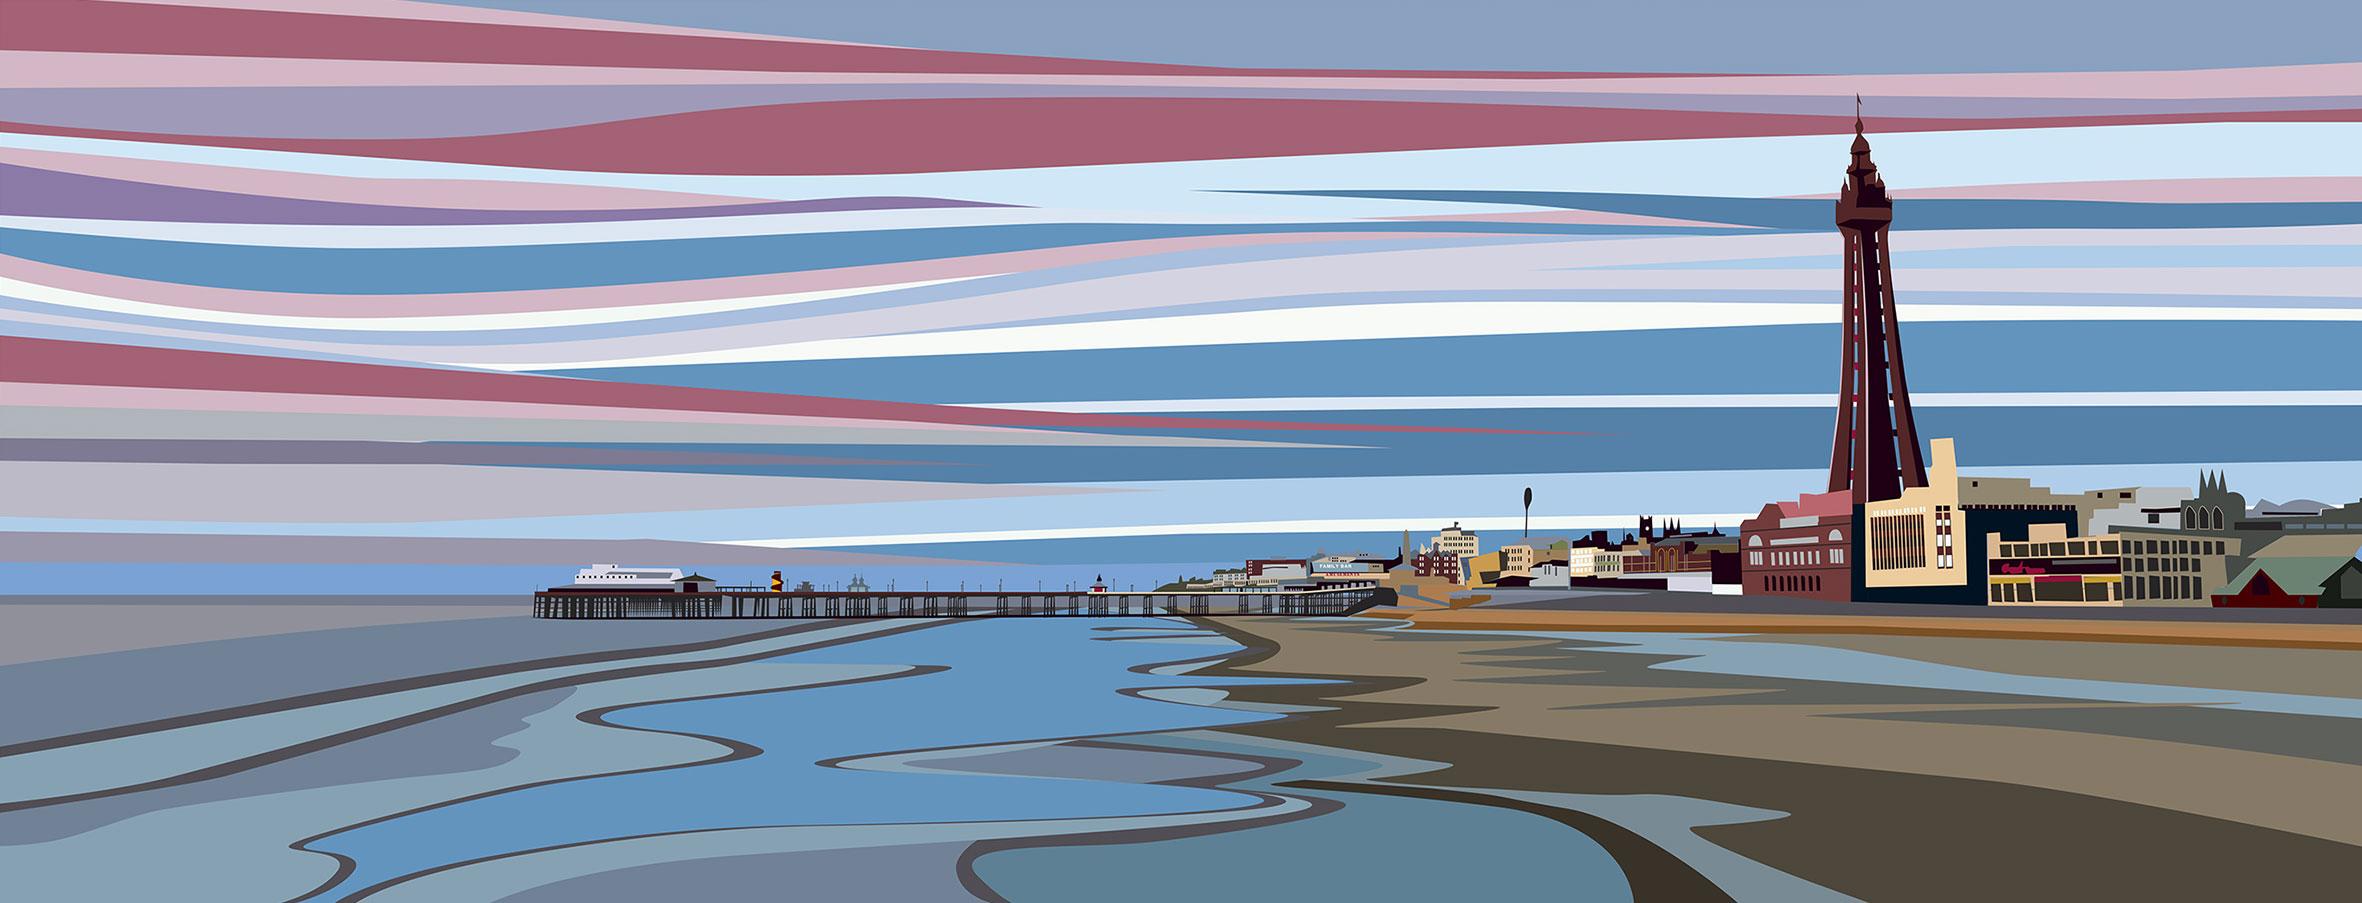 Evening Sky over Blackpool Beach. 2020